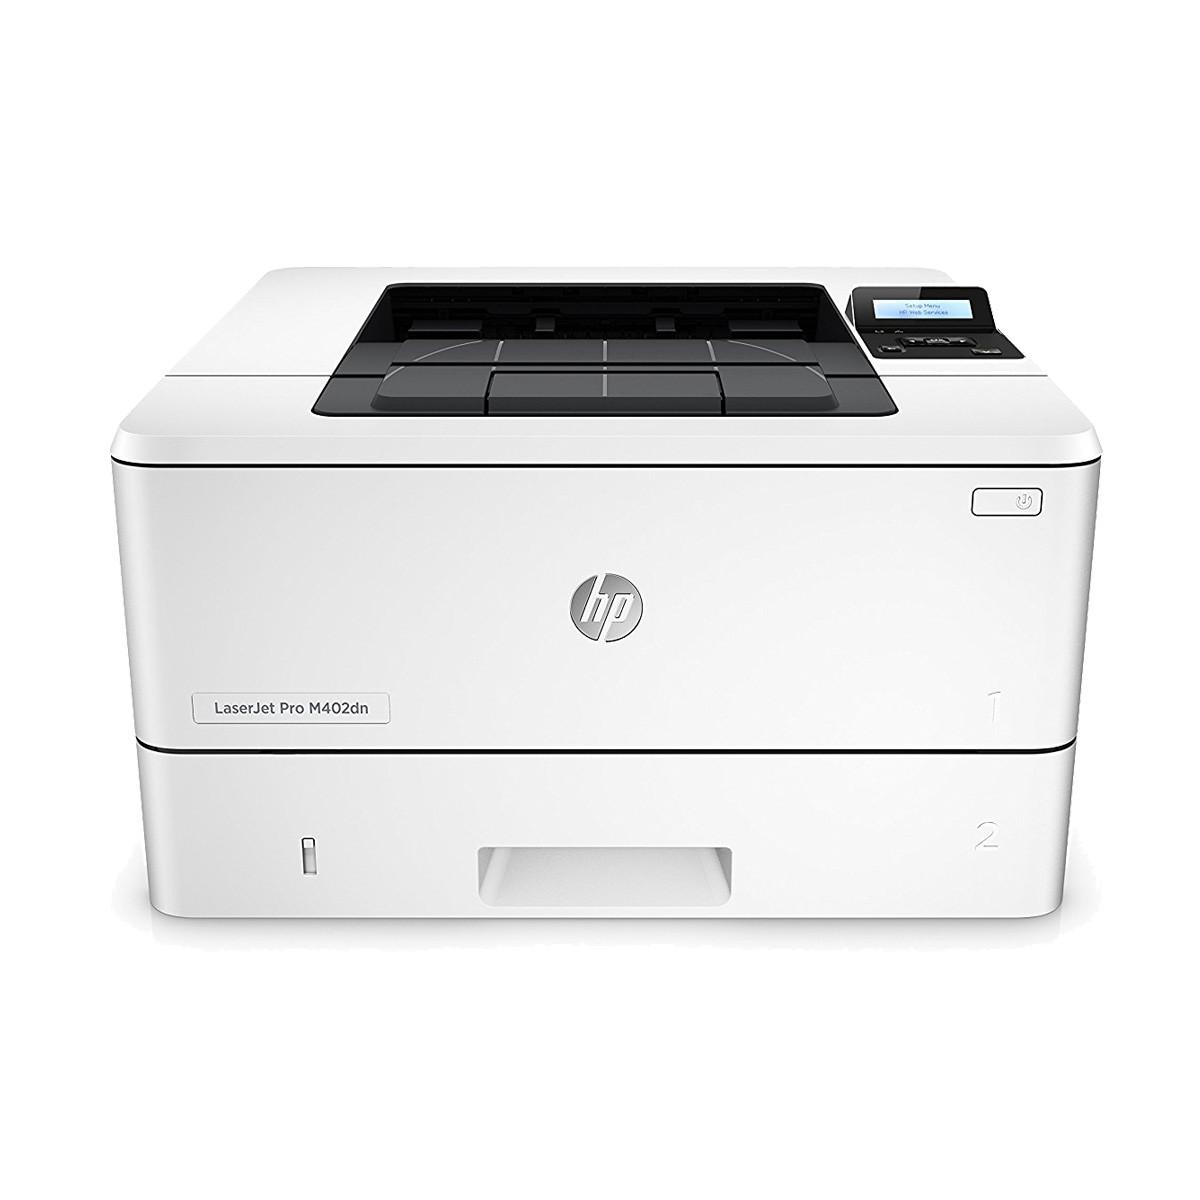 HP LaserJet Pro M402dn Printer (Duplex & Network)